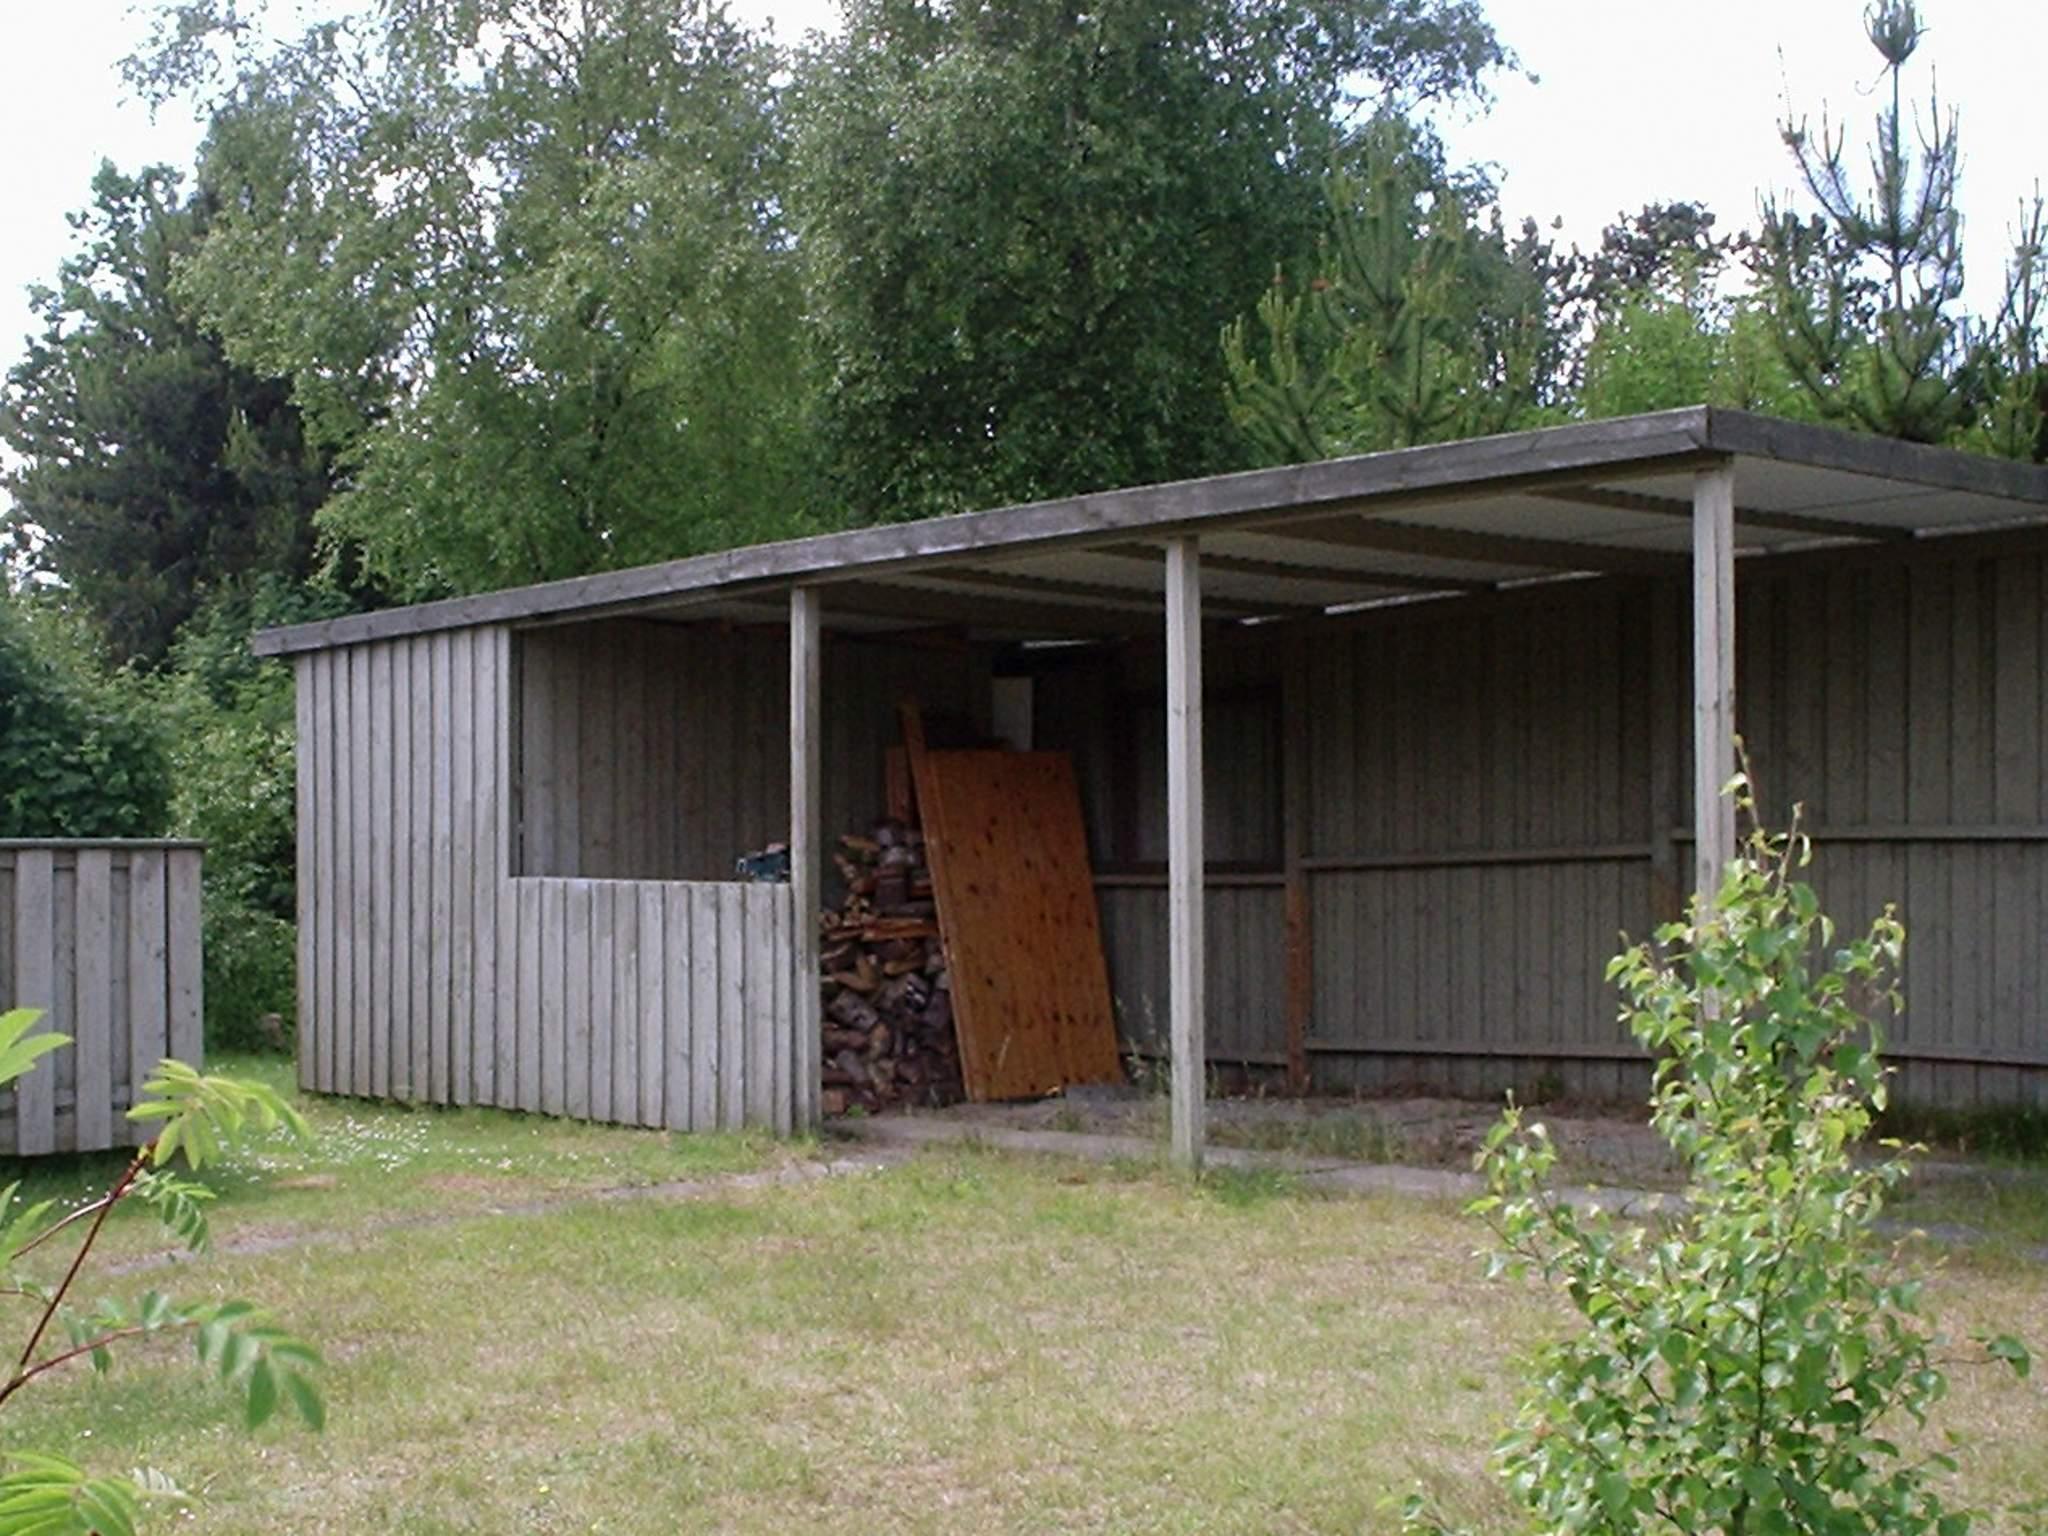 Ferienhaus Hou/Lagunen (84779), Hou, , Dänische Ostsee, Dänemark, Bild 13